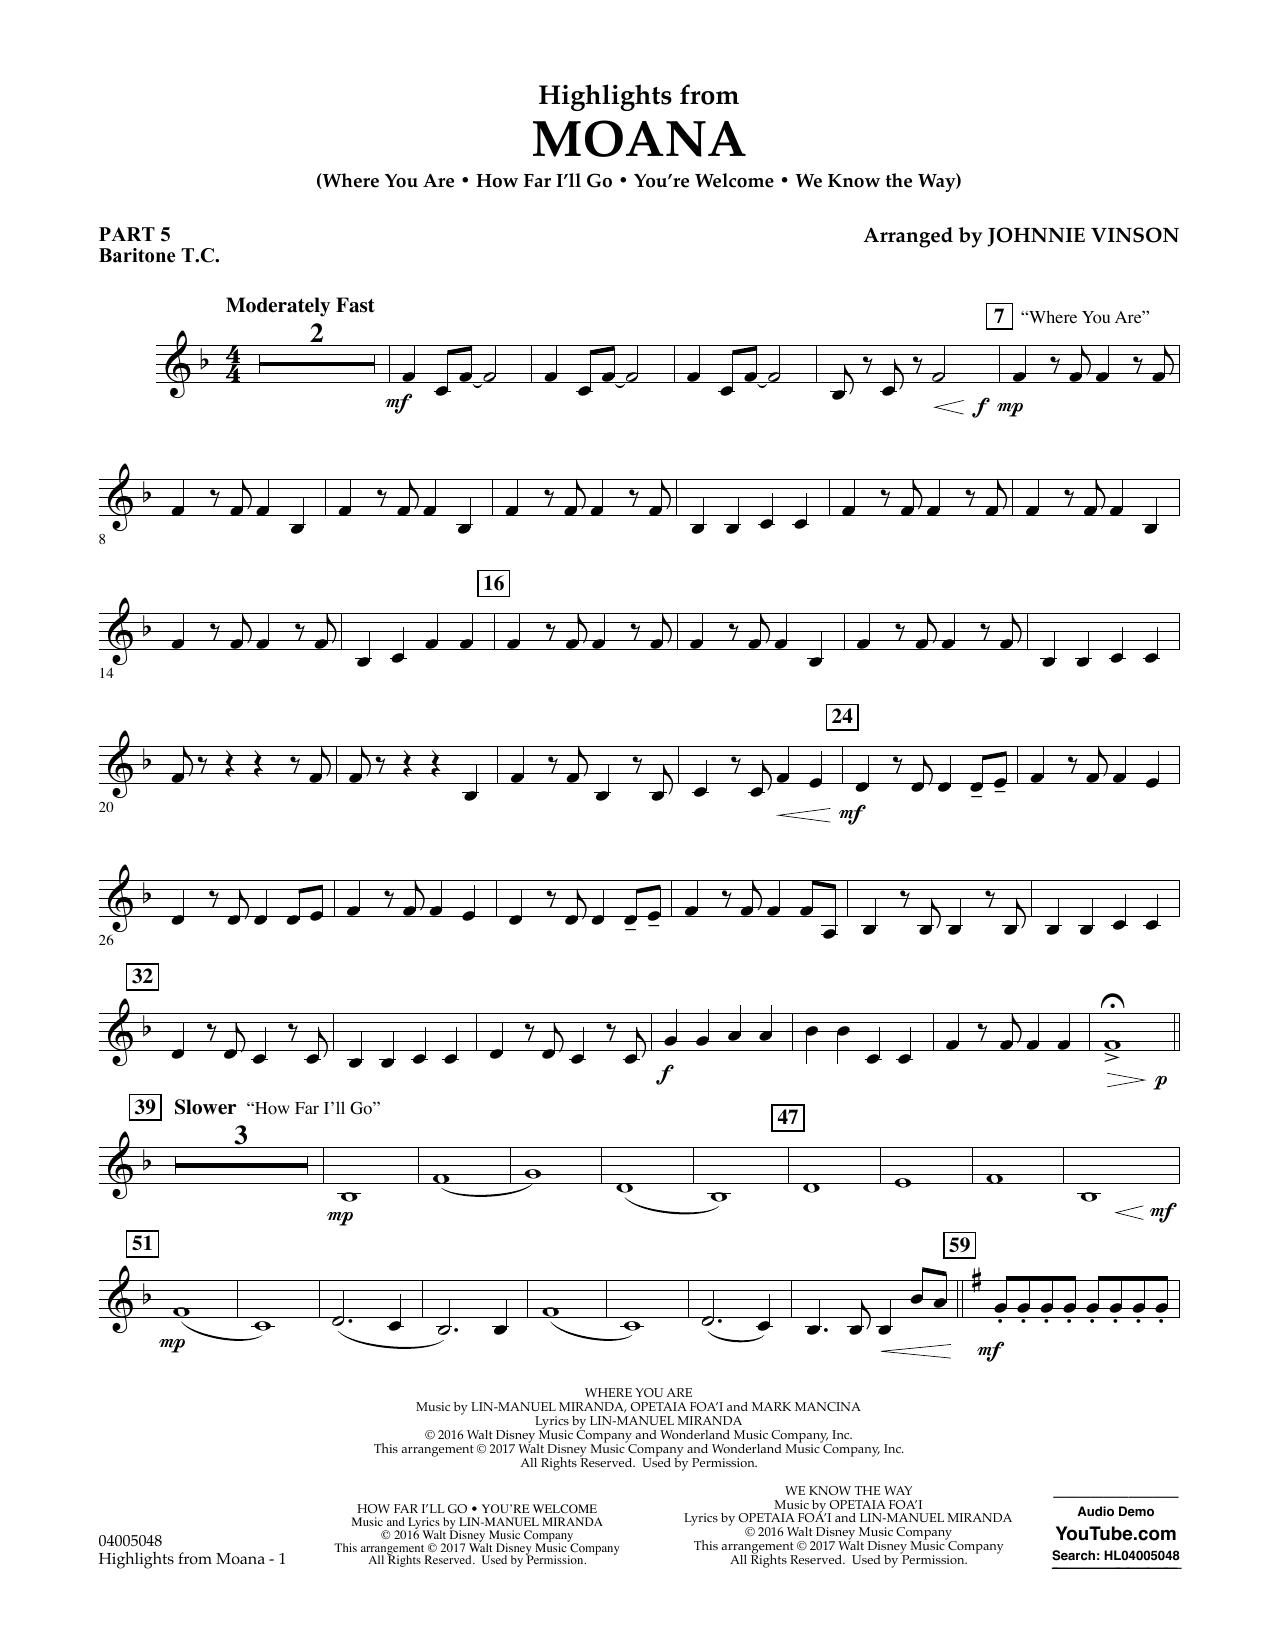 Highlights from Moana - Pt.5 - Baritone T.C. Sheet Music